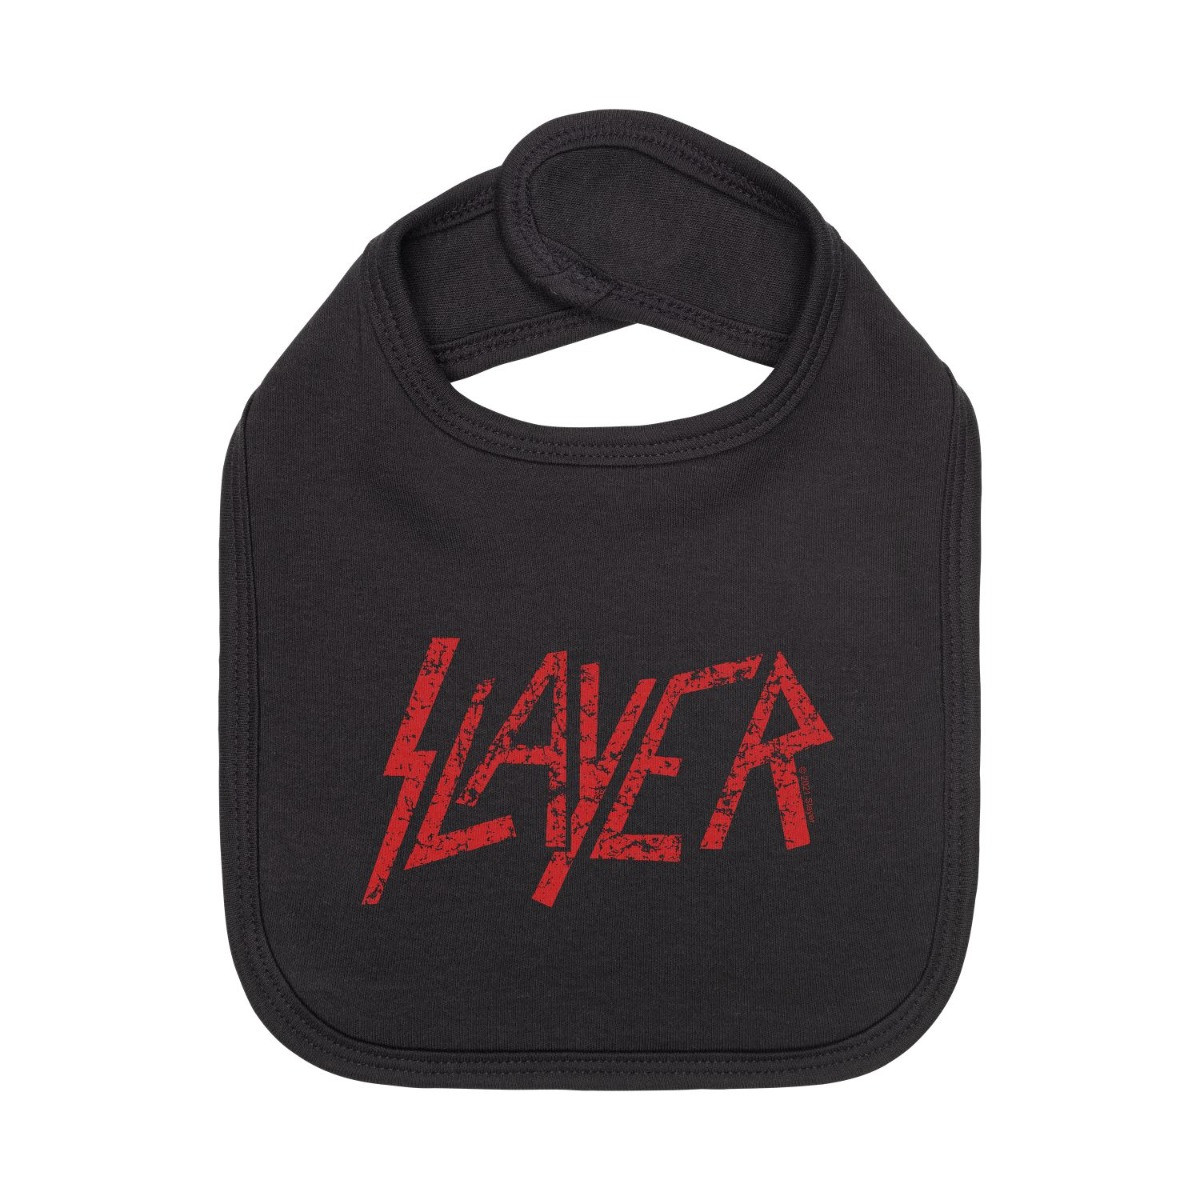 Slayer bib red logo